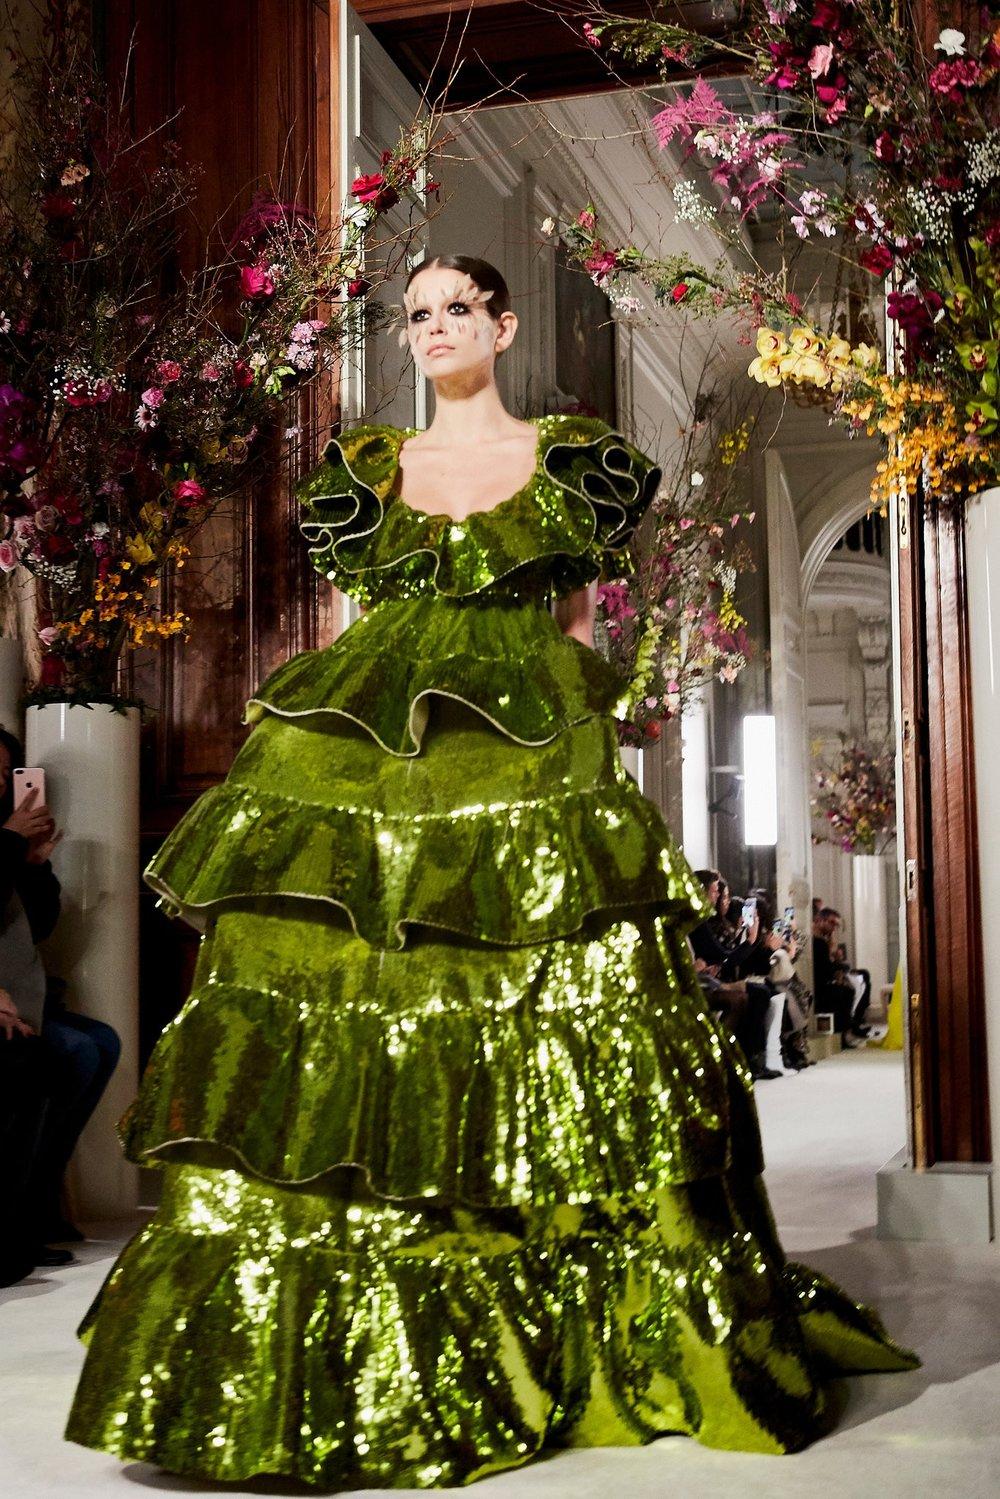 Couture-slide-FYC7-superJumbo[1].jpg